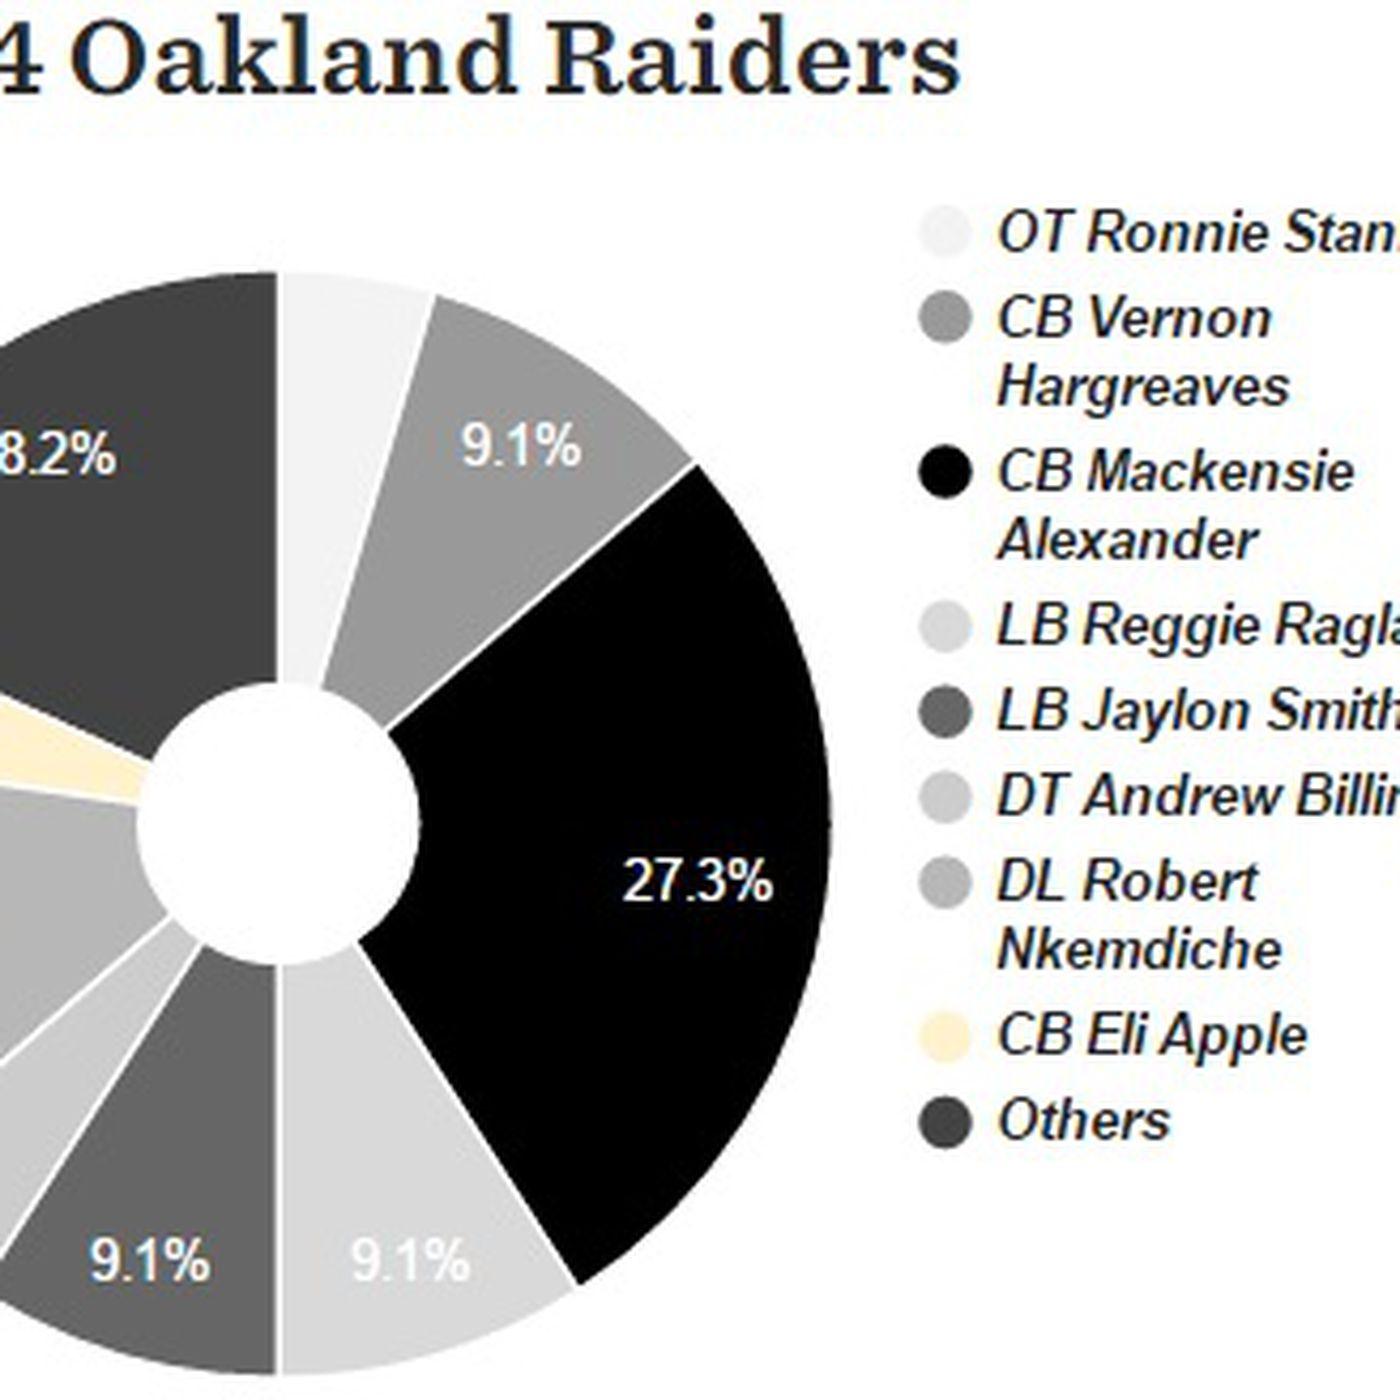 2016 nfl mock draft database pie charts who do experts have raiders 2016 nfl mock draft database pie charts who do experts have raiders taking silver and black pride geenschuldenfo Gallery